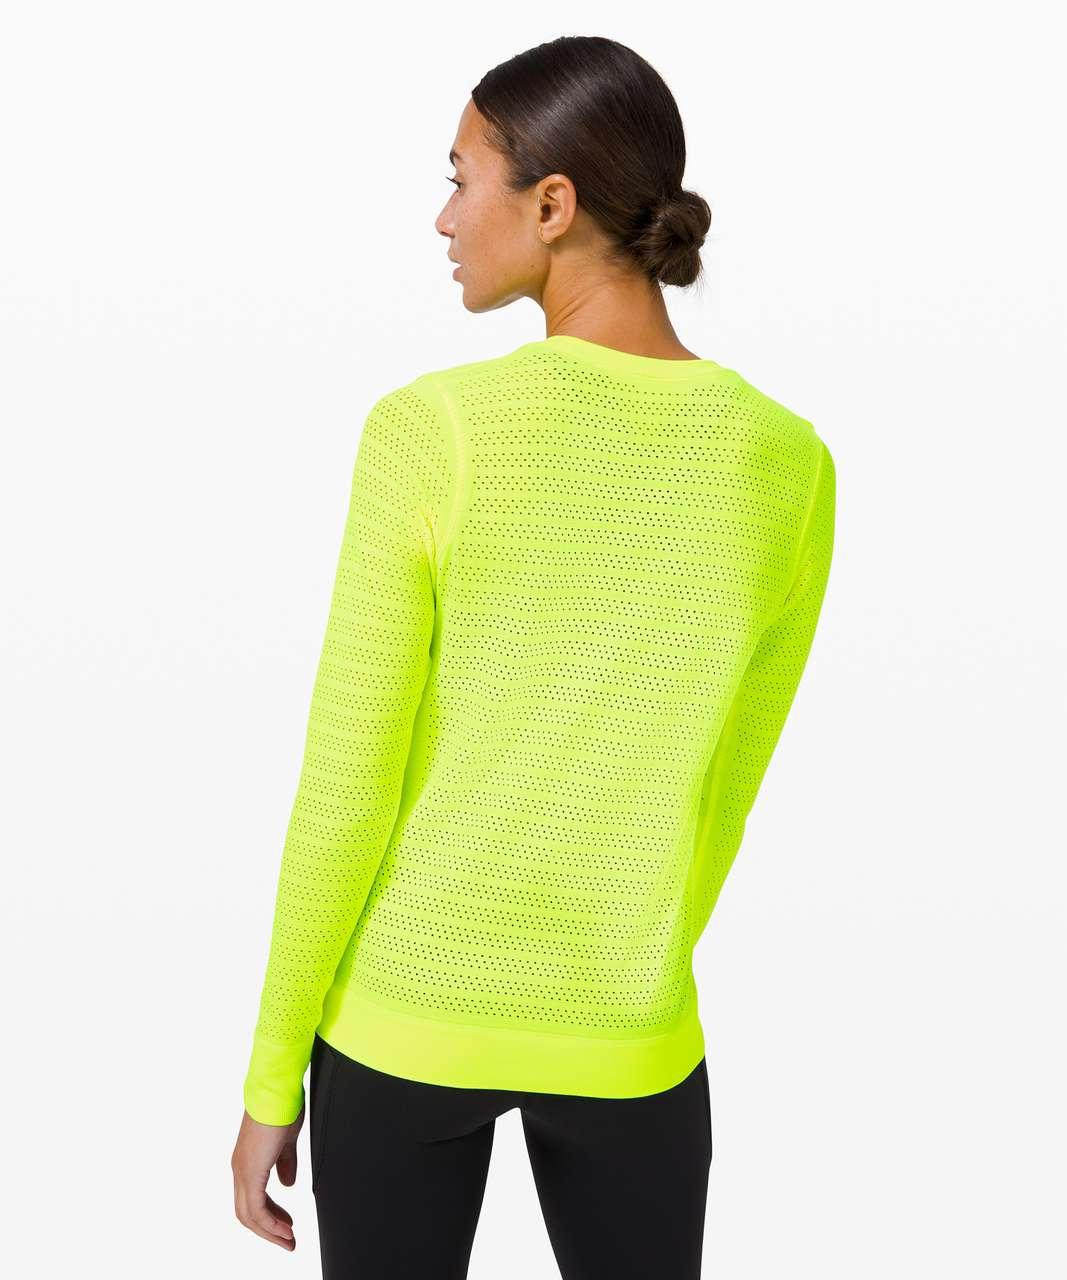 Lululemon Swiftly Breathe Long Sleeve Squad - Yellow Highlight / Yellow Highlight